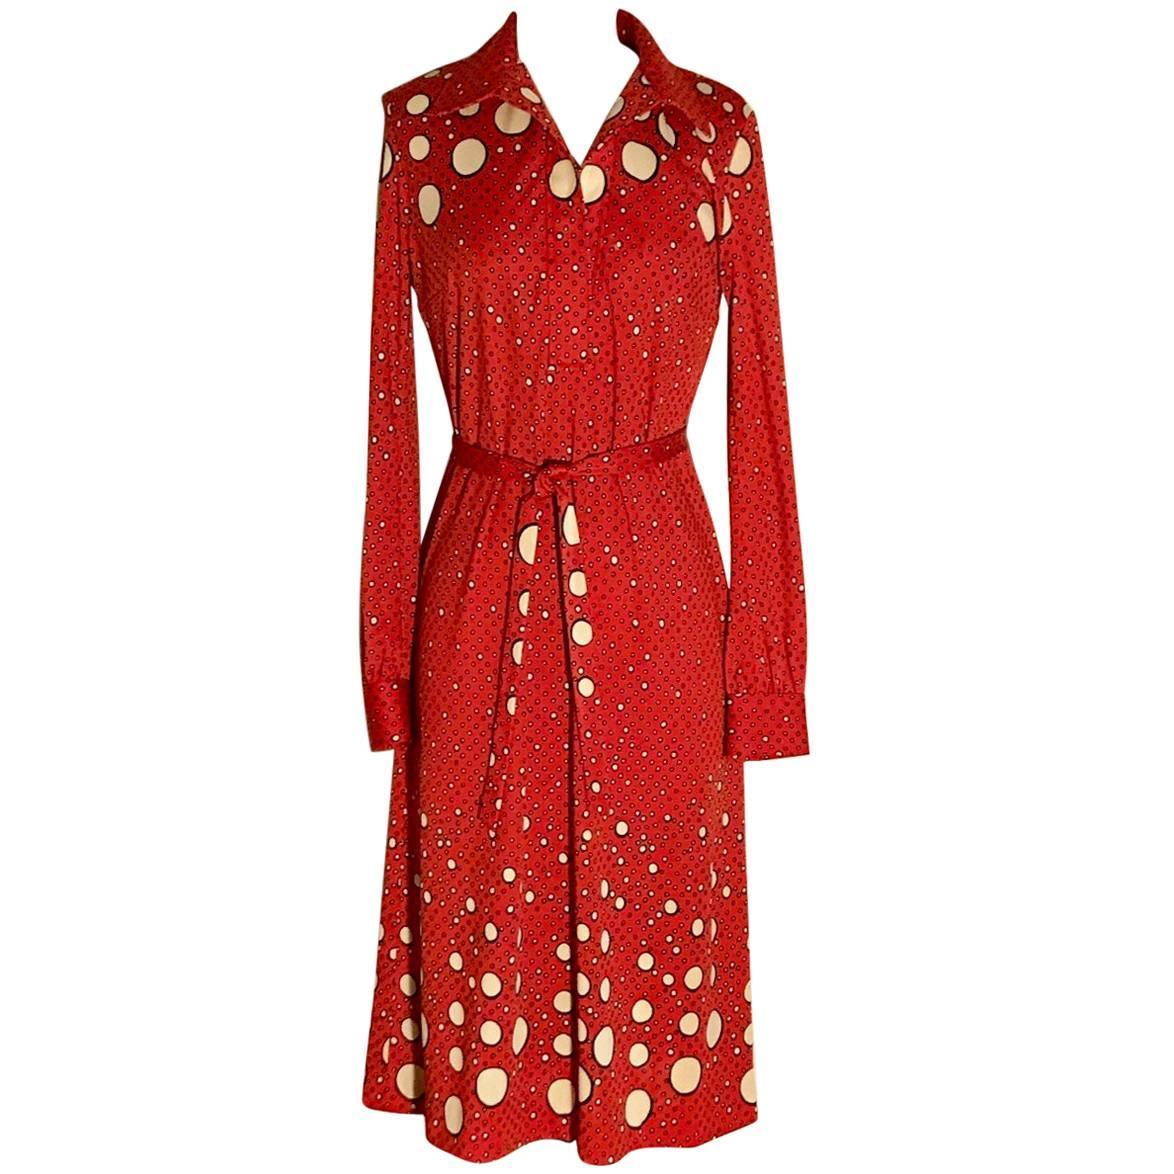 Roberta di Camerino Red and Cream Polka Dot Shirt Dress, 1970s